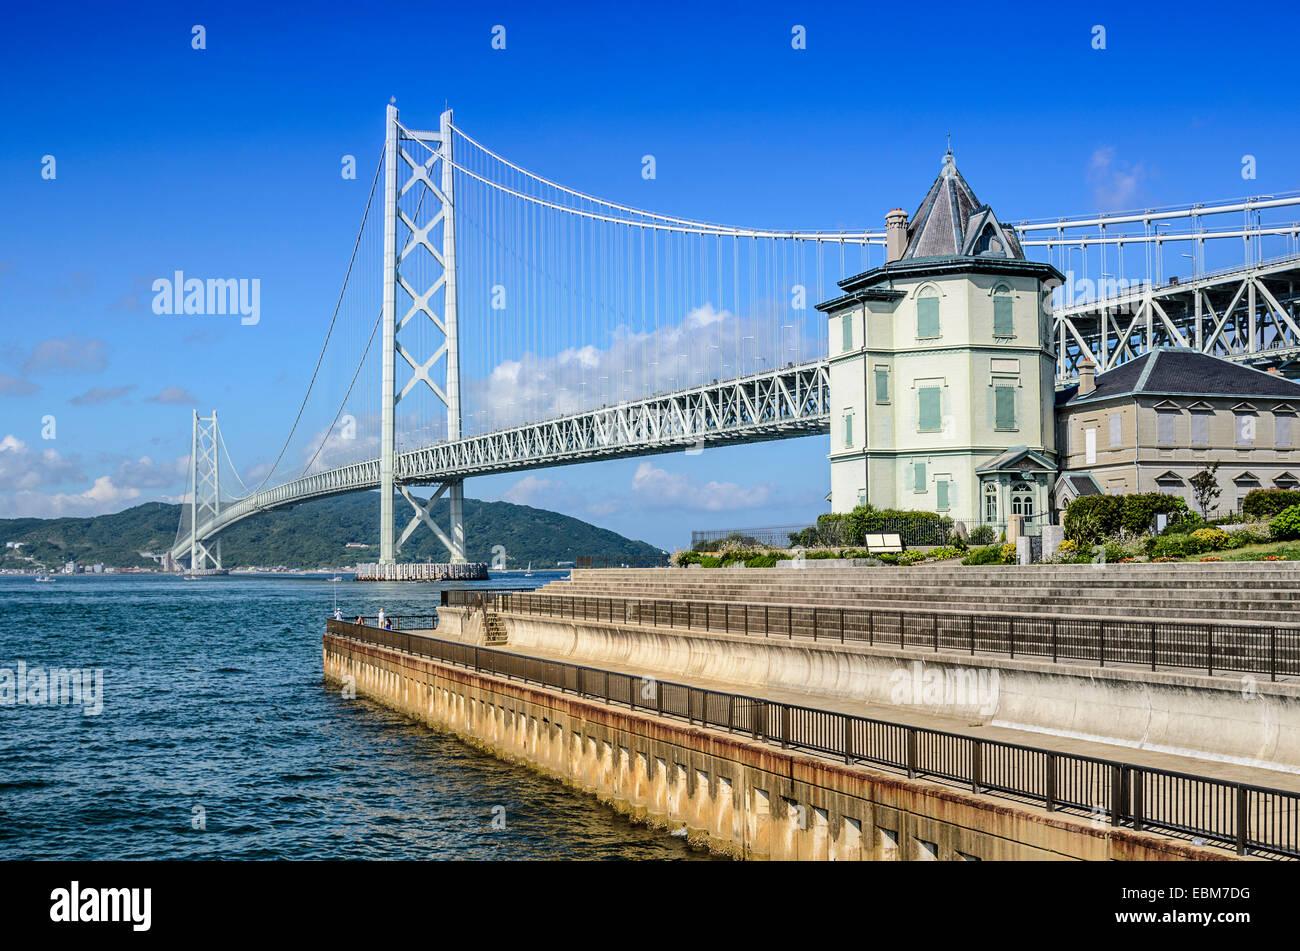 Kobe, Japan at Akashi Kaikyo Bridge spanning the Seto Inland Sea to Awaji Island. - Stock Image